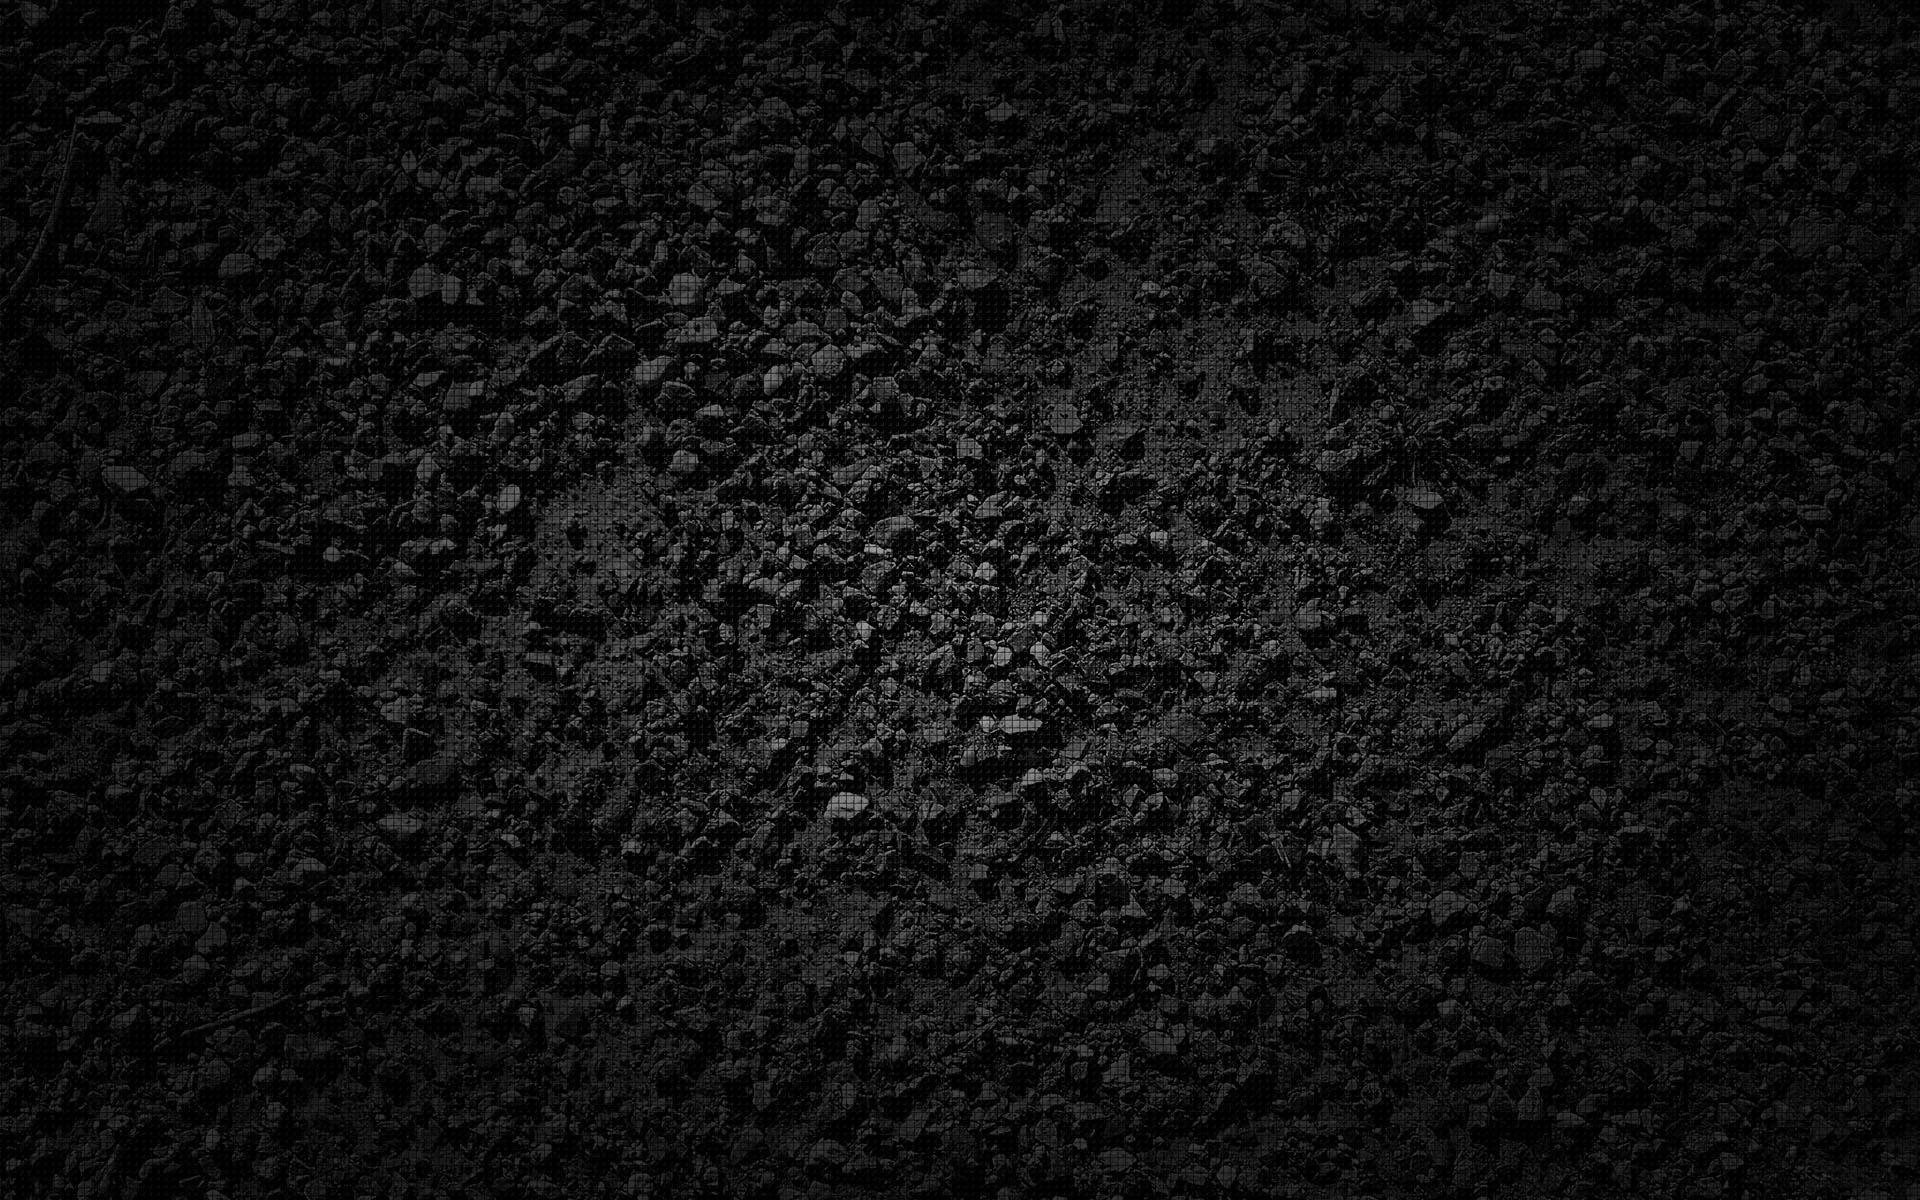 black marble wallpaper hd - photo #26